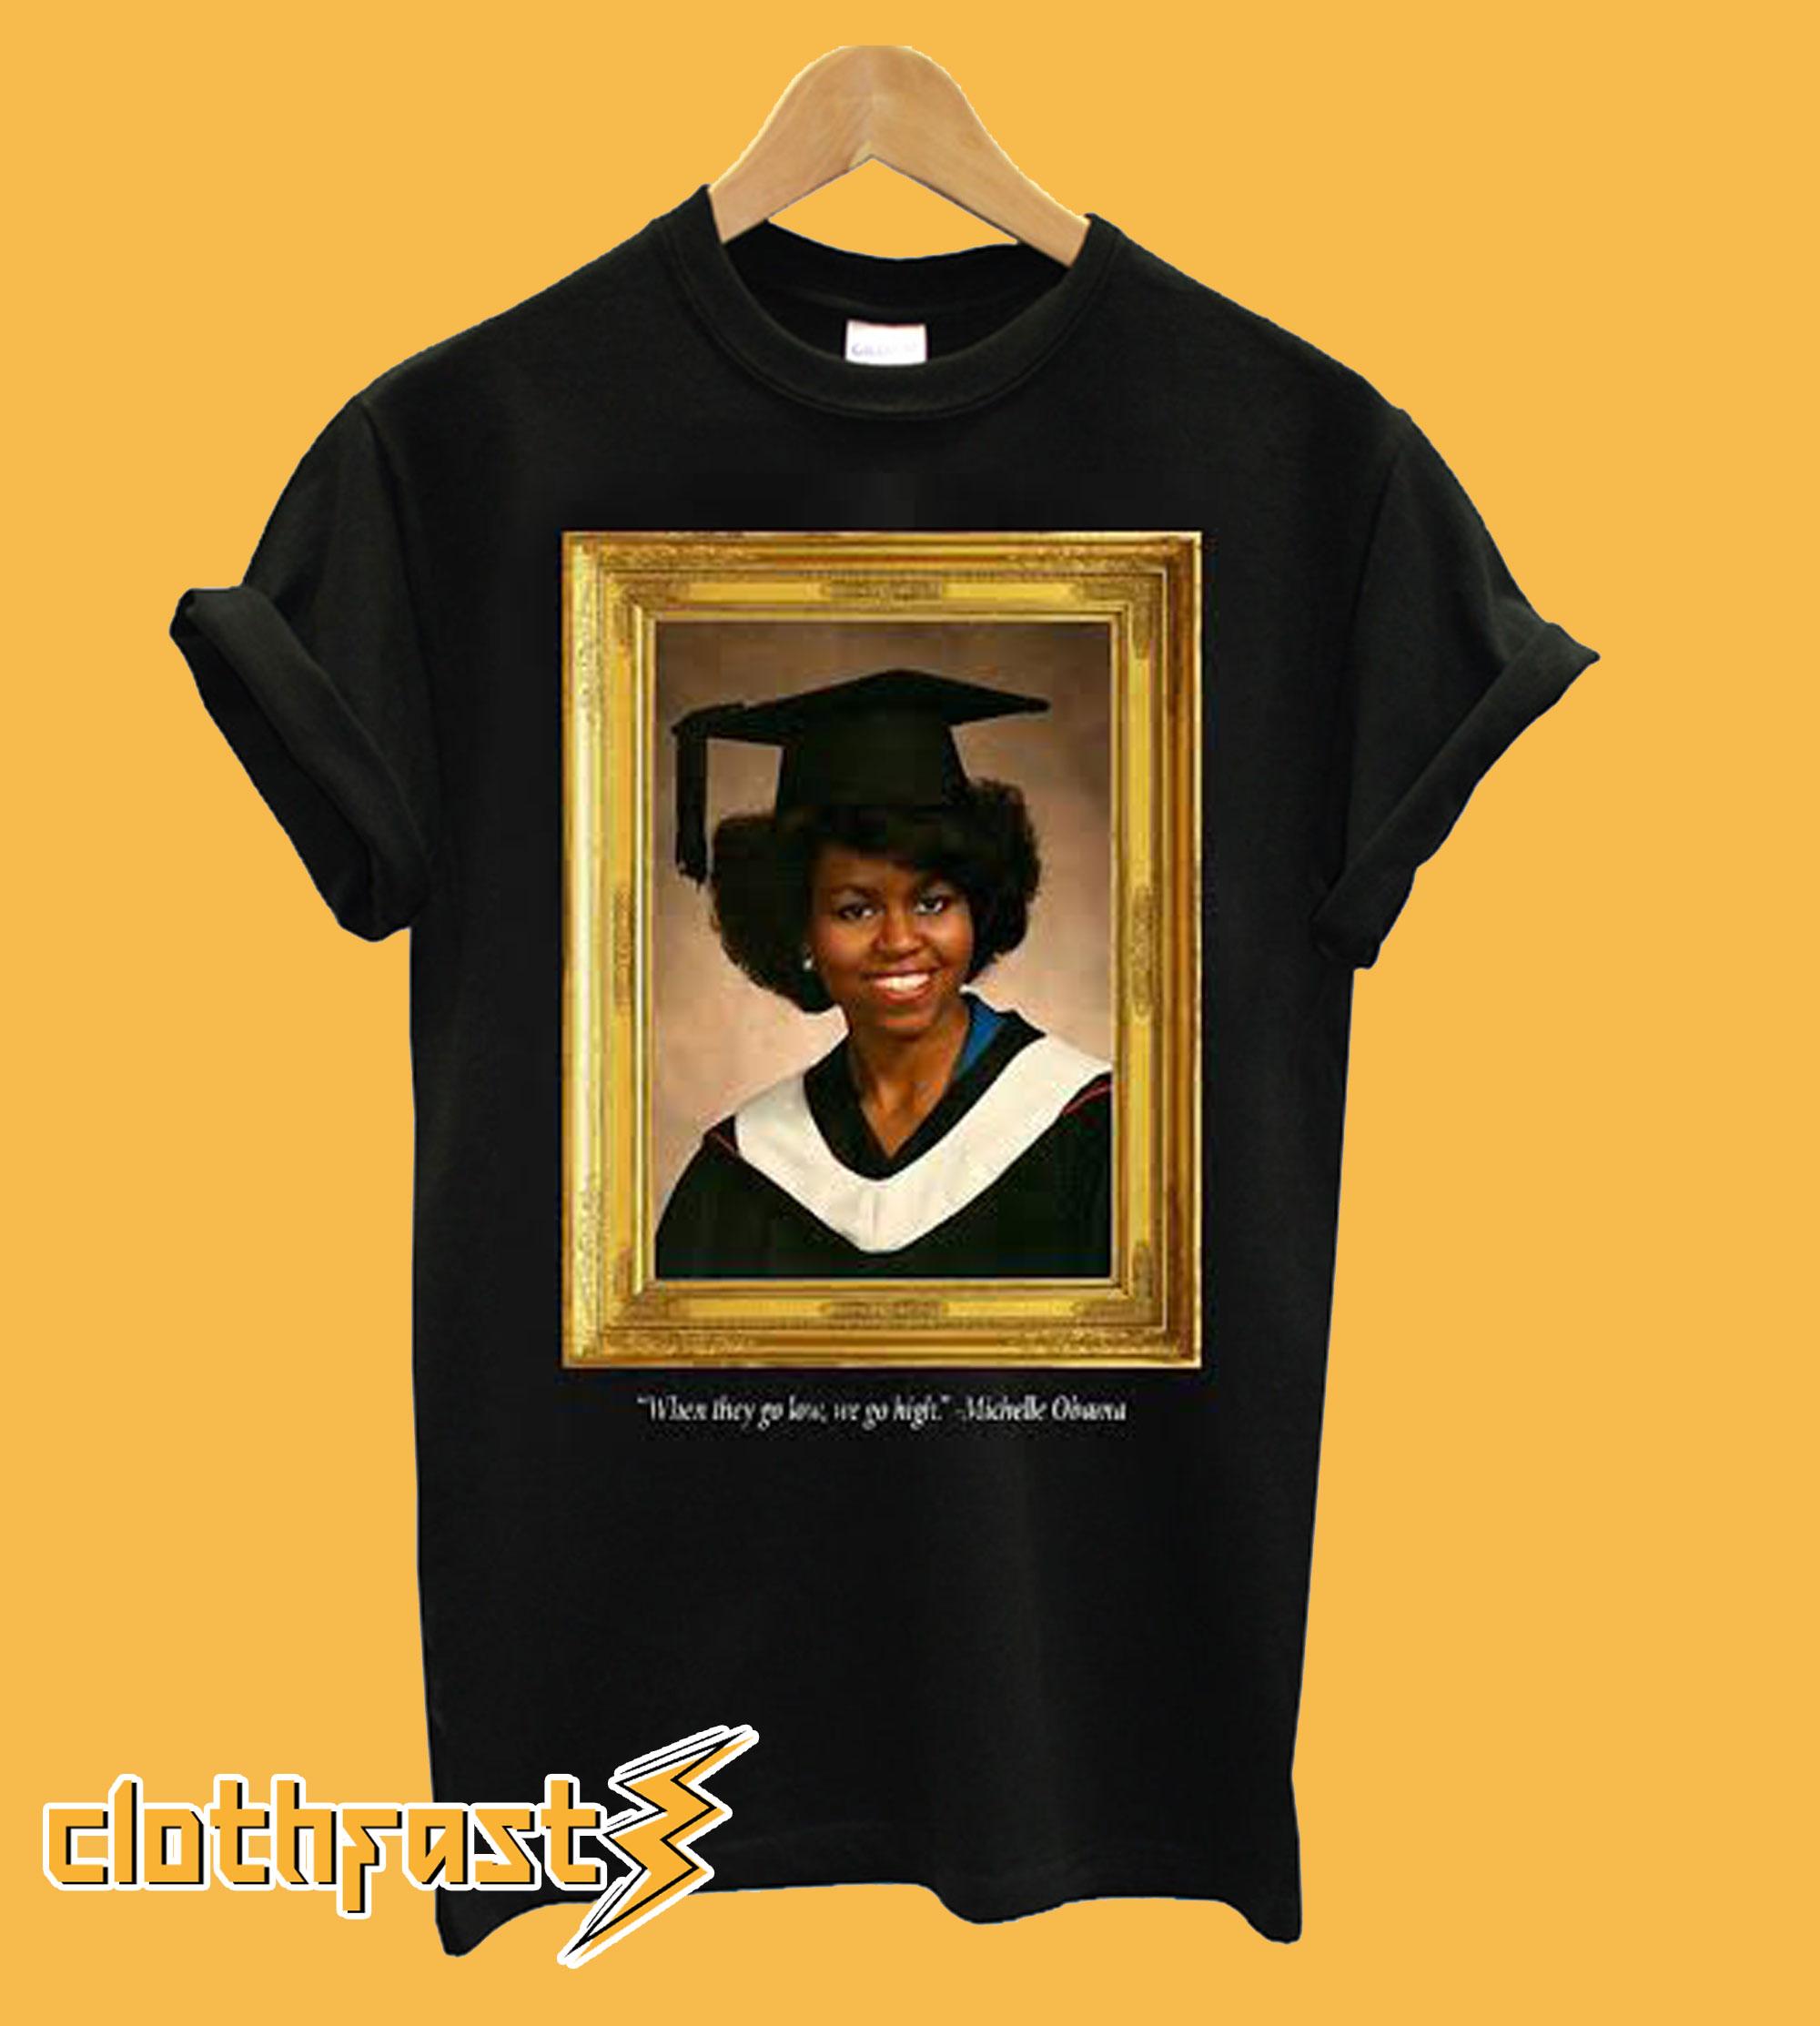 Michelle Obama Graduation Portrait When they go low we go high T shirt